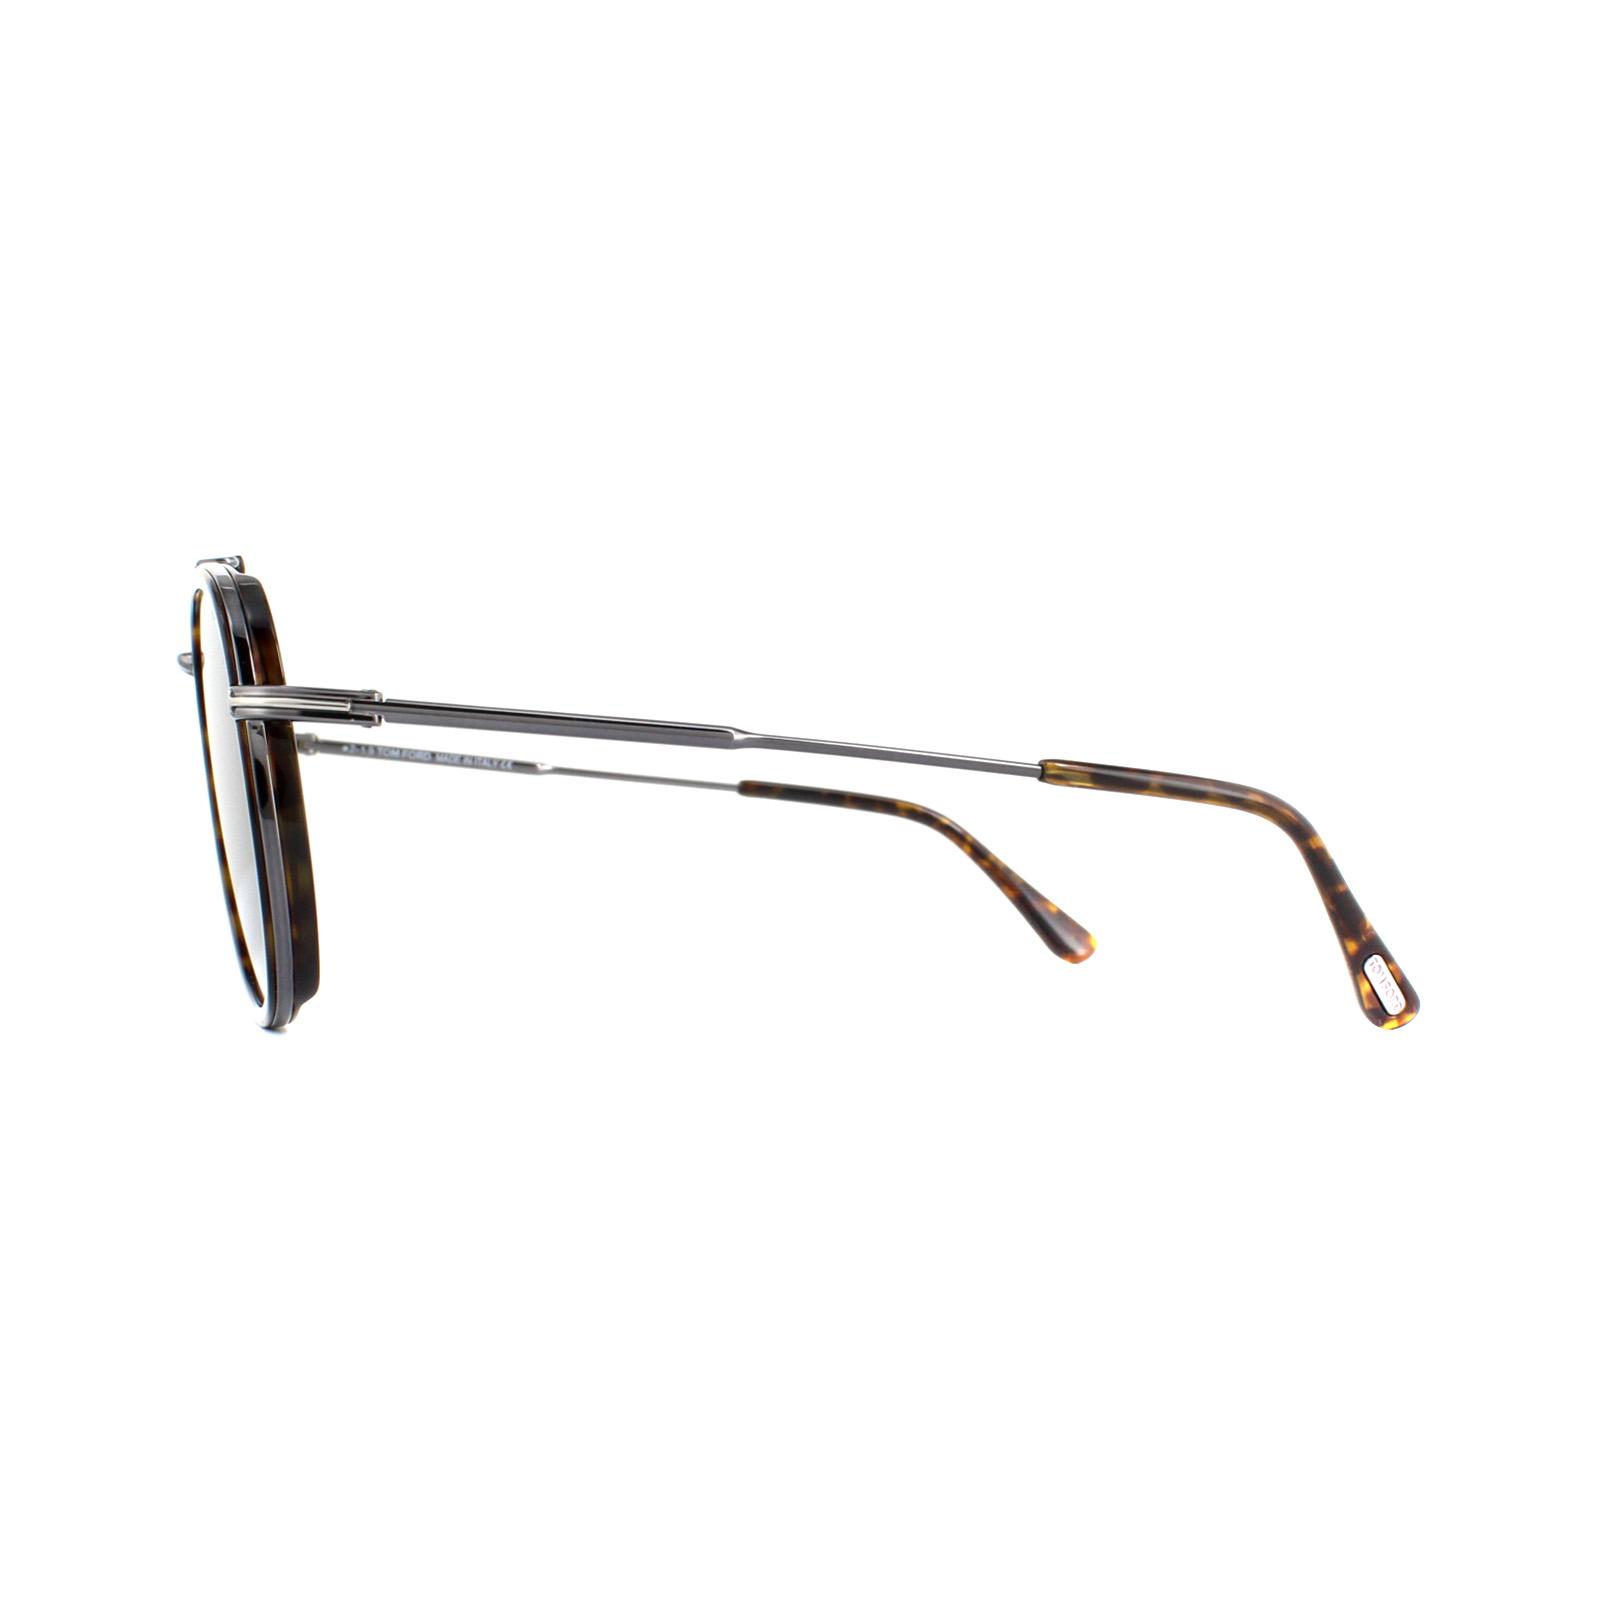 6876969824171 Cheap Tom Ford Tripp 0666 Sunglasses - Discounted Sunglasses